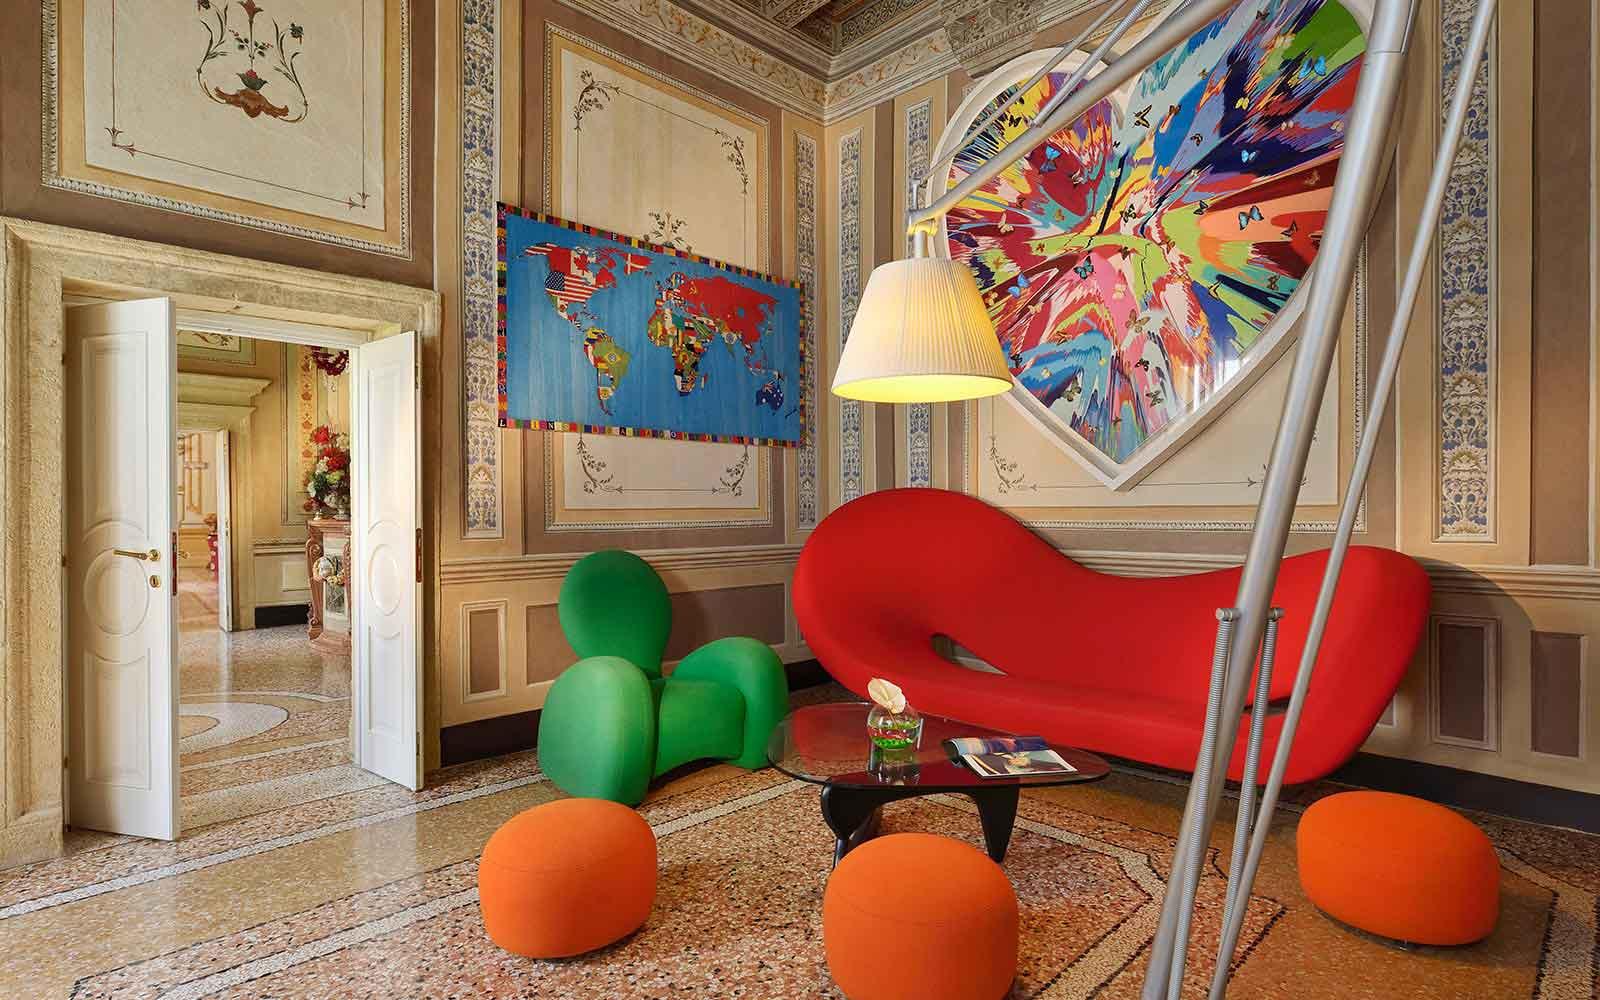 Byblos Art Hotel Villa Amistà Verona Italie : Salon